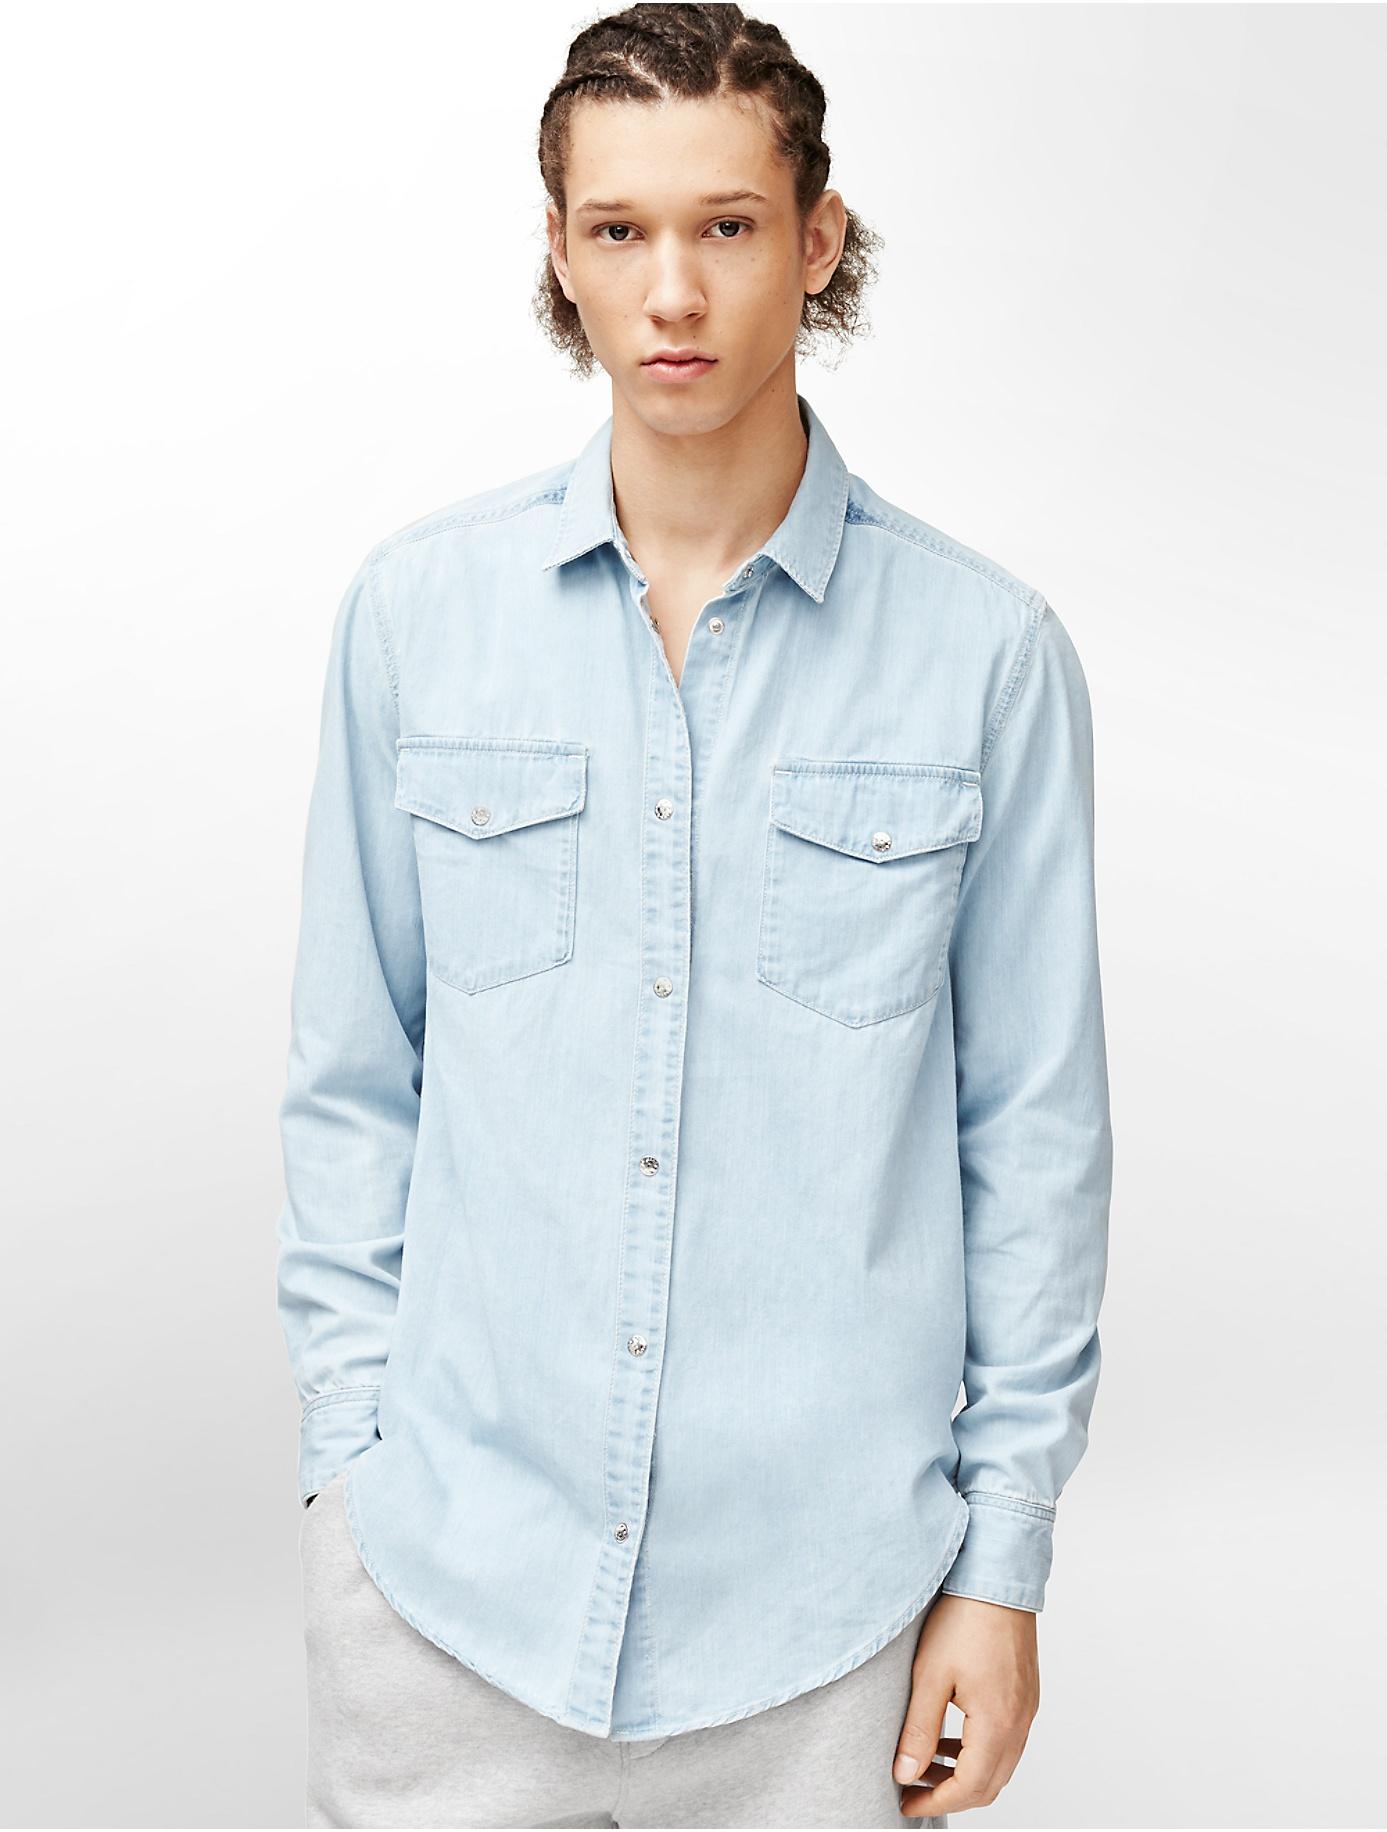 #MyCalvins: Shop Latest Calvin Klein Jeans Denim Styles